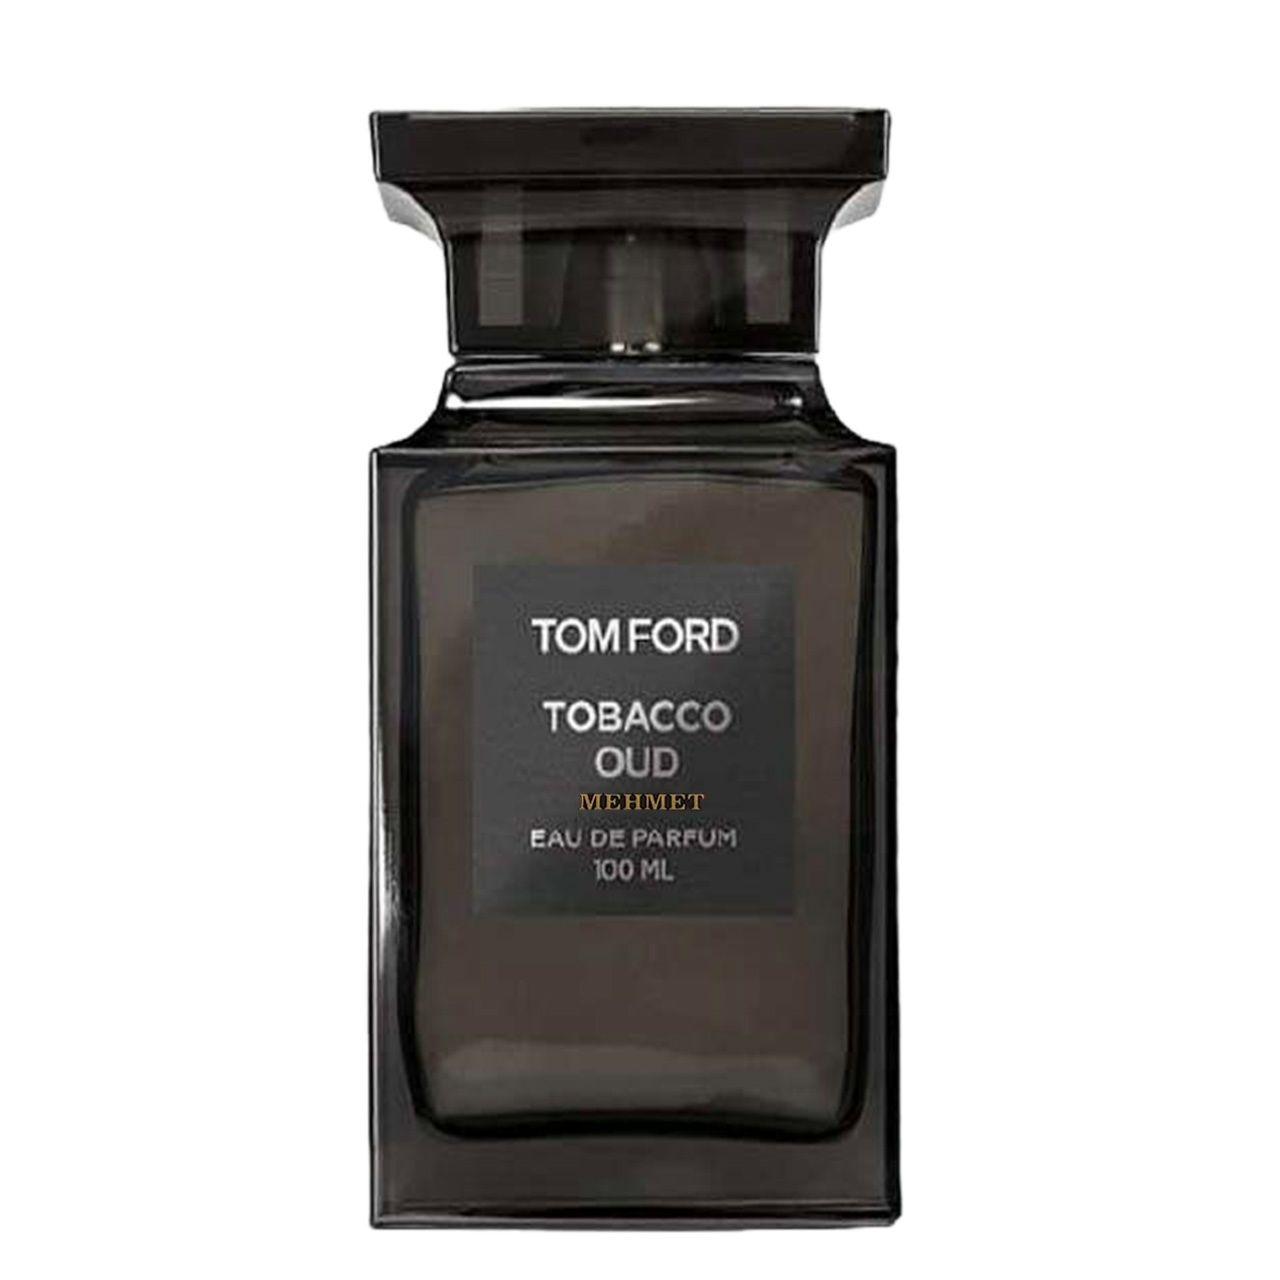 ادو پرفیوم مردانه مهمت مدل Tom ford Tobacco Oud  حجم 100 میلی لیتر